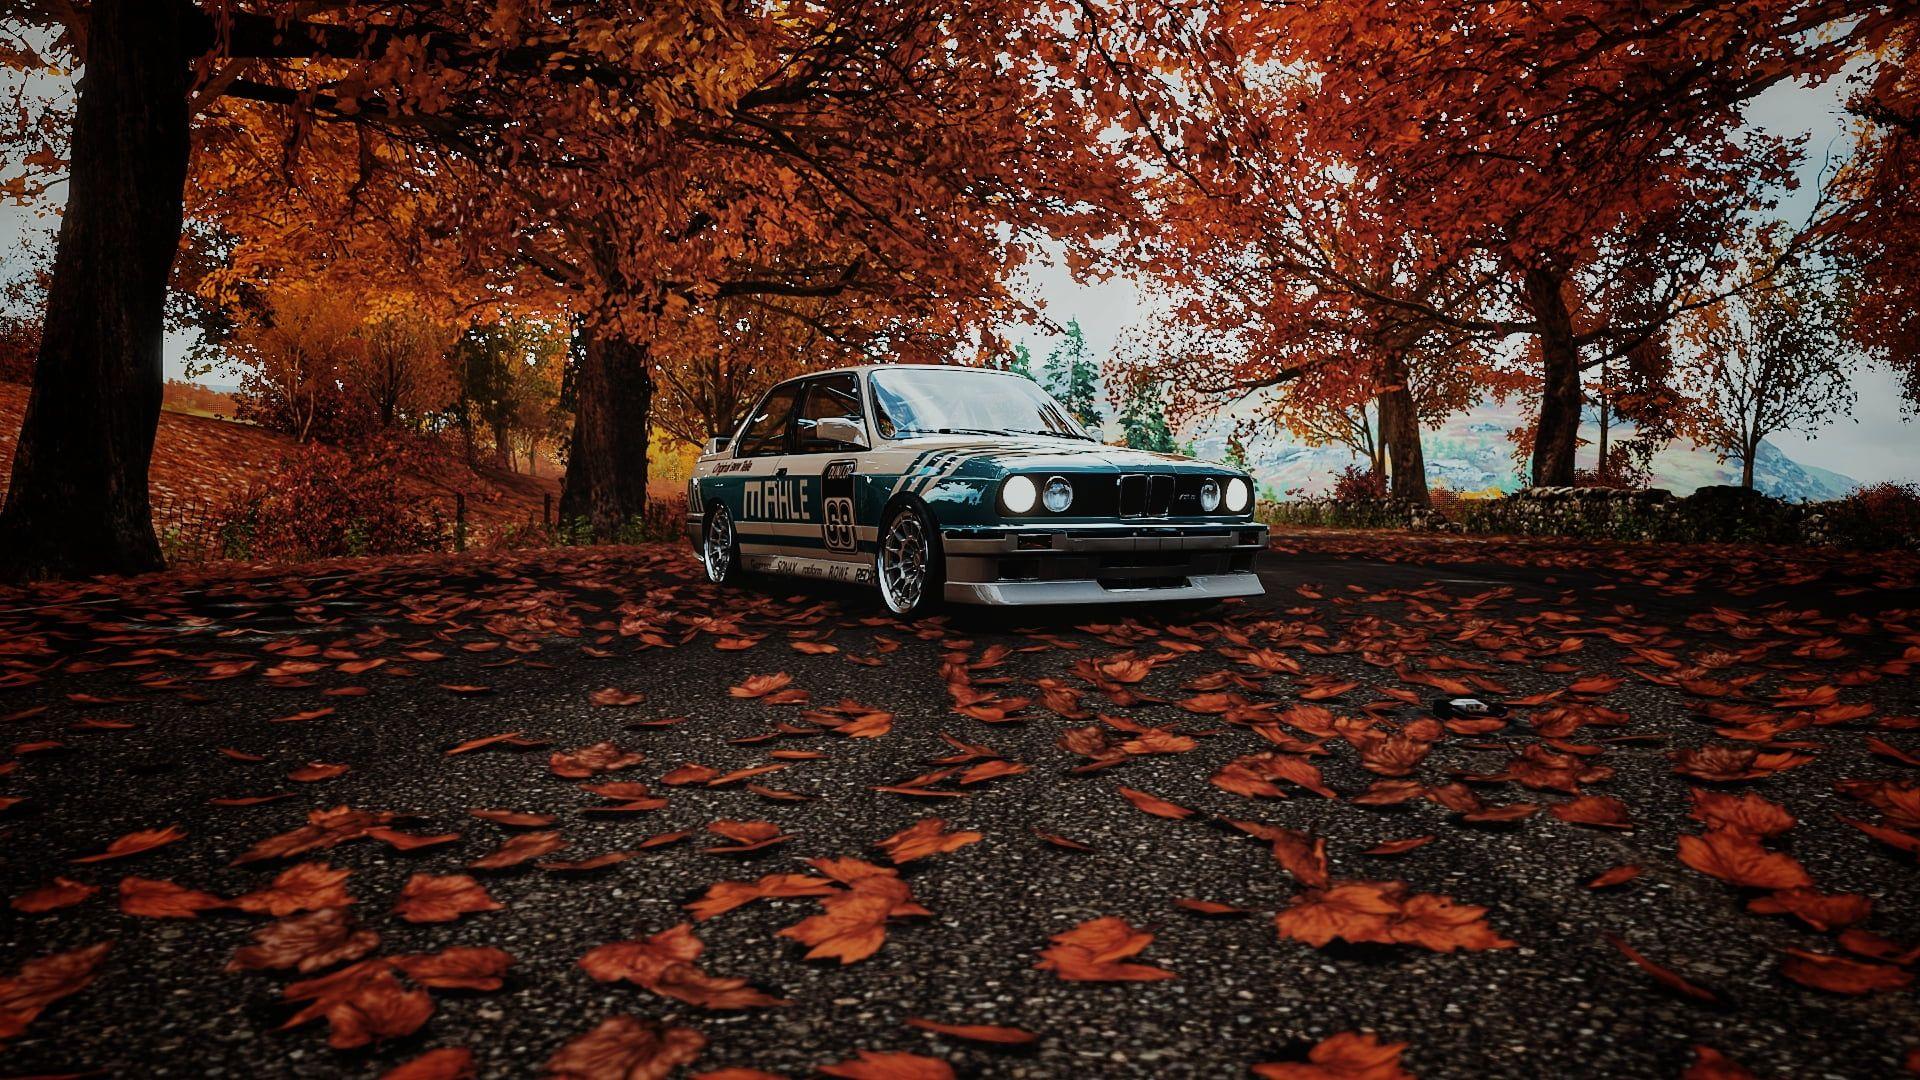 Bmw M3 E30 Bmw M3 E30 Car Forza Horizon 4 Video Games Mahle Jp Performance Fall 1080p Wallpaper Hdwallpaper Desktop In 2021 Forza Horizon 4 Forza Bmw M3